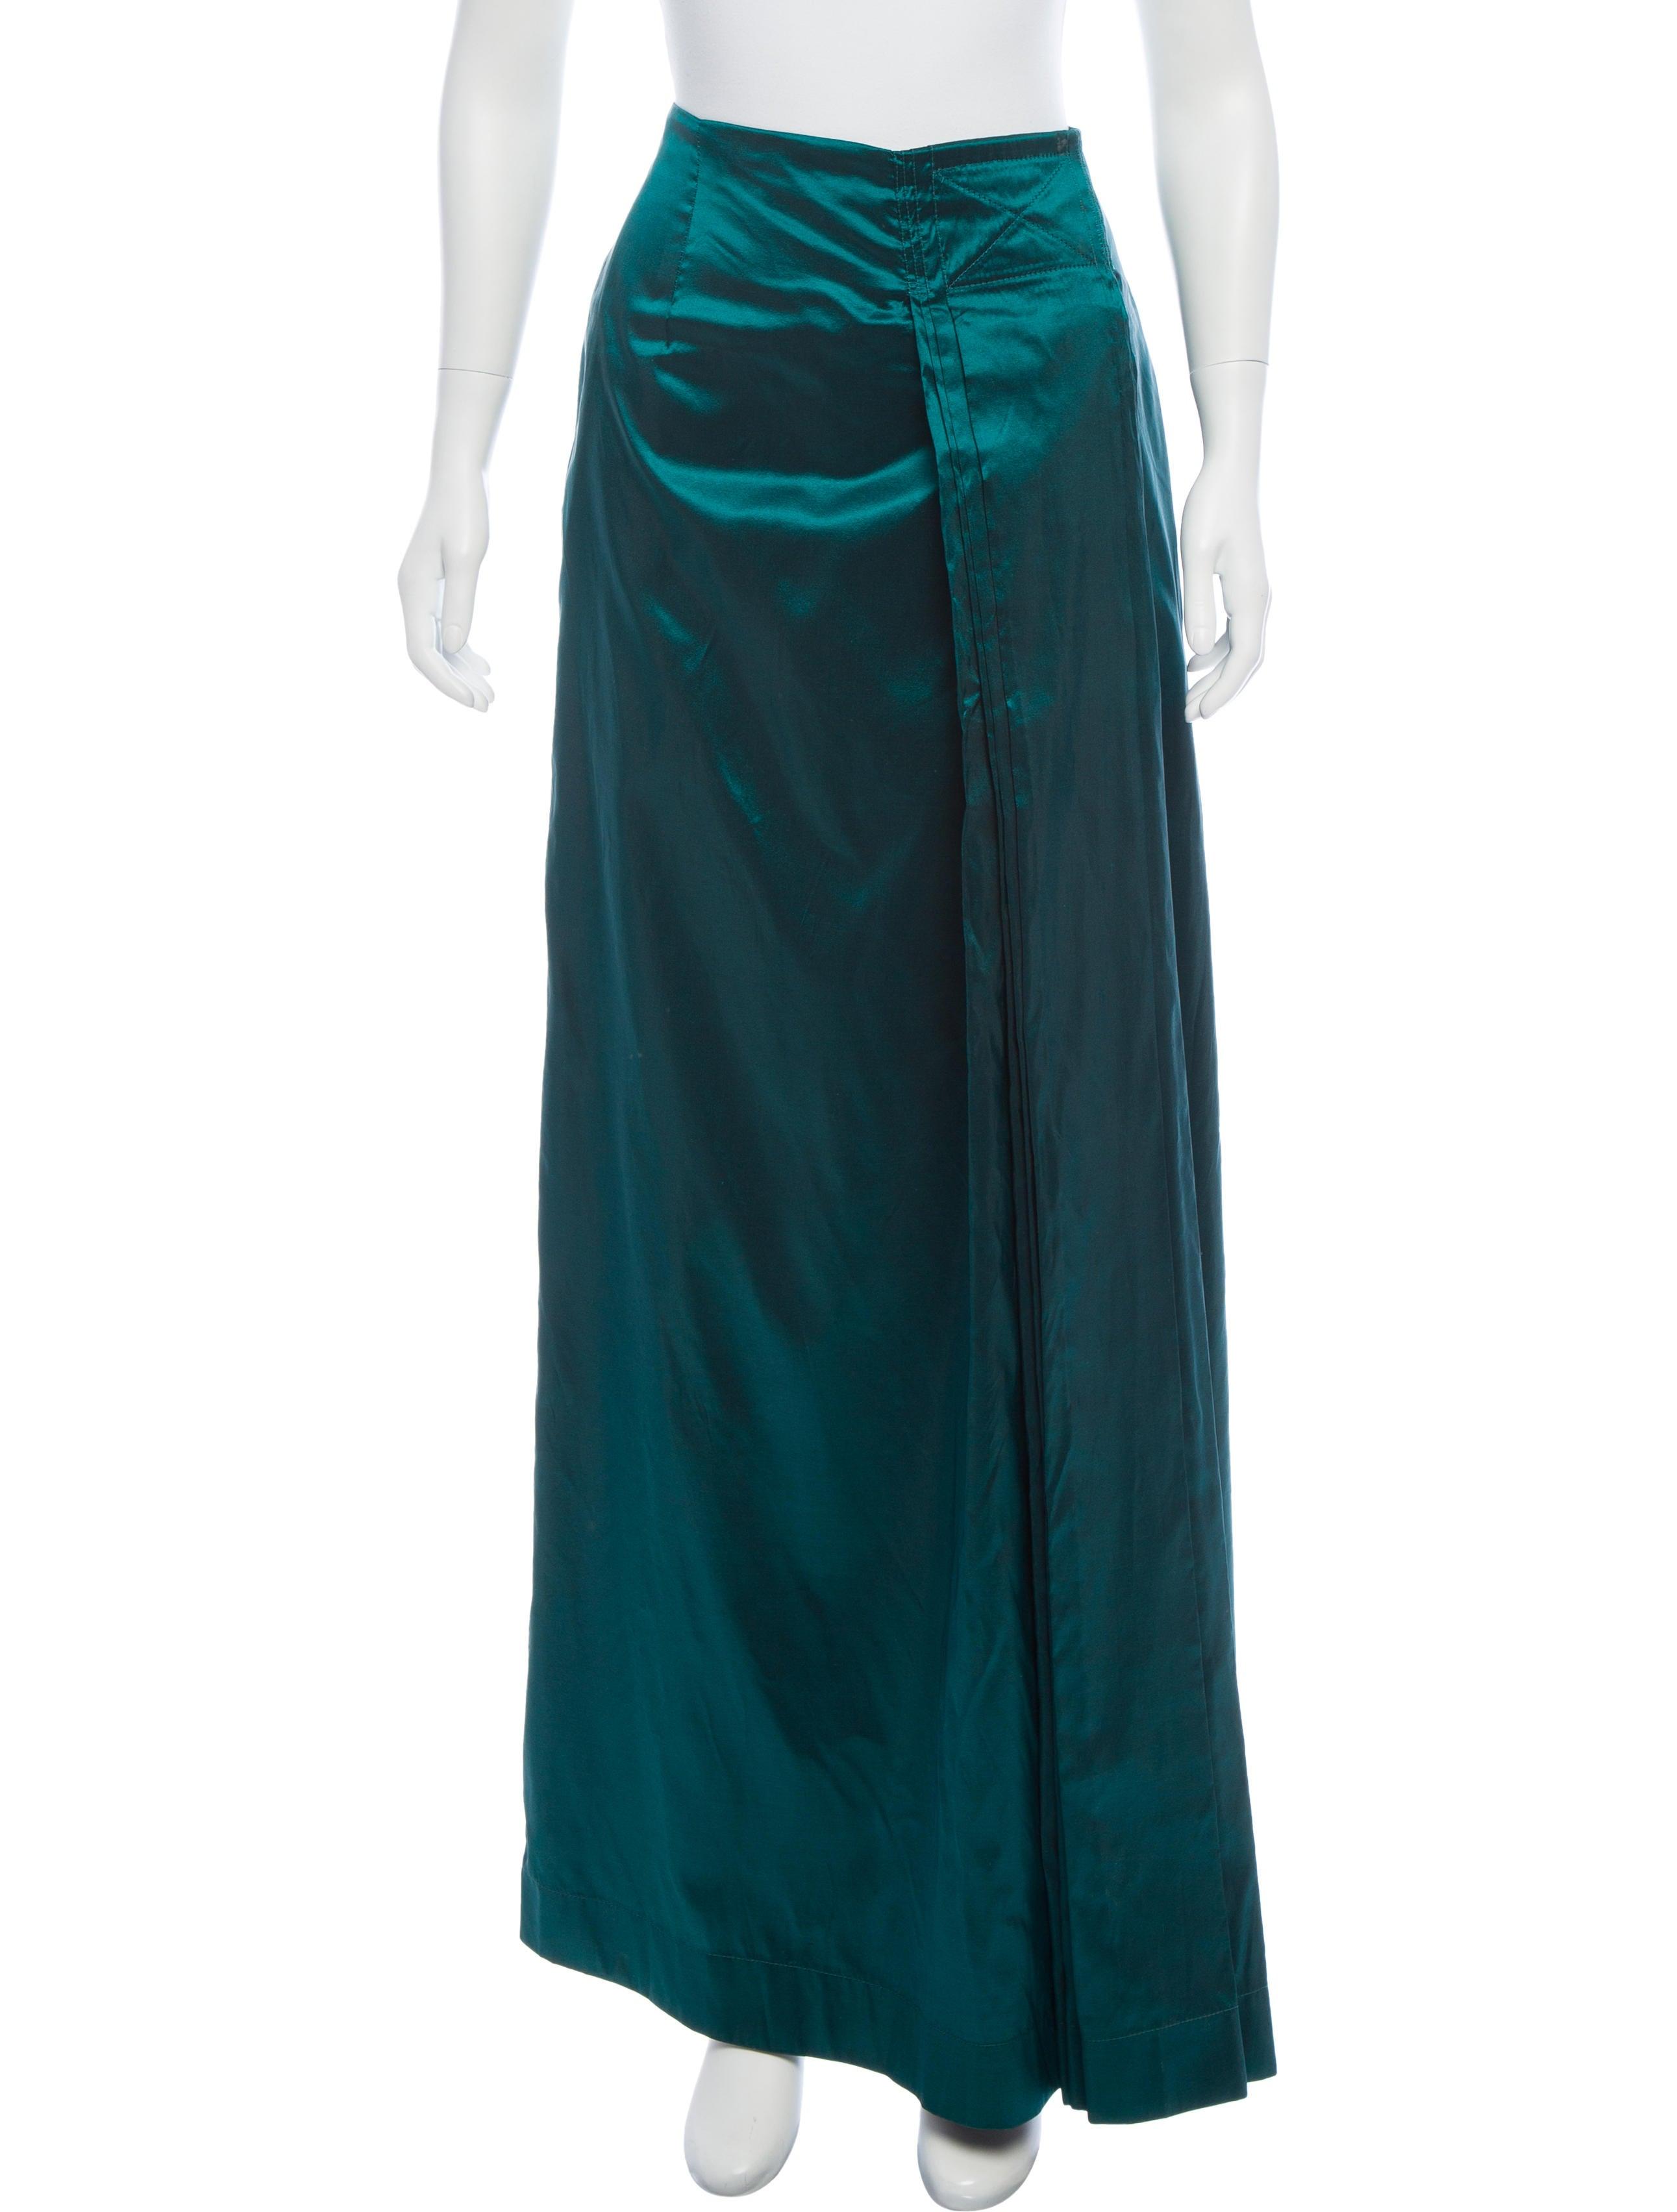 0f1b3cbcc2f2ba Sea Green Maxi Skirt – DACC